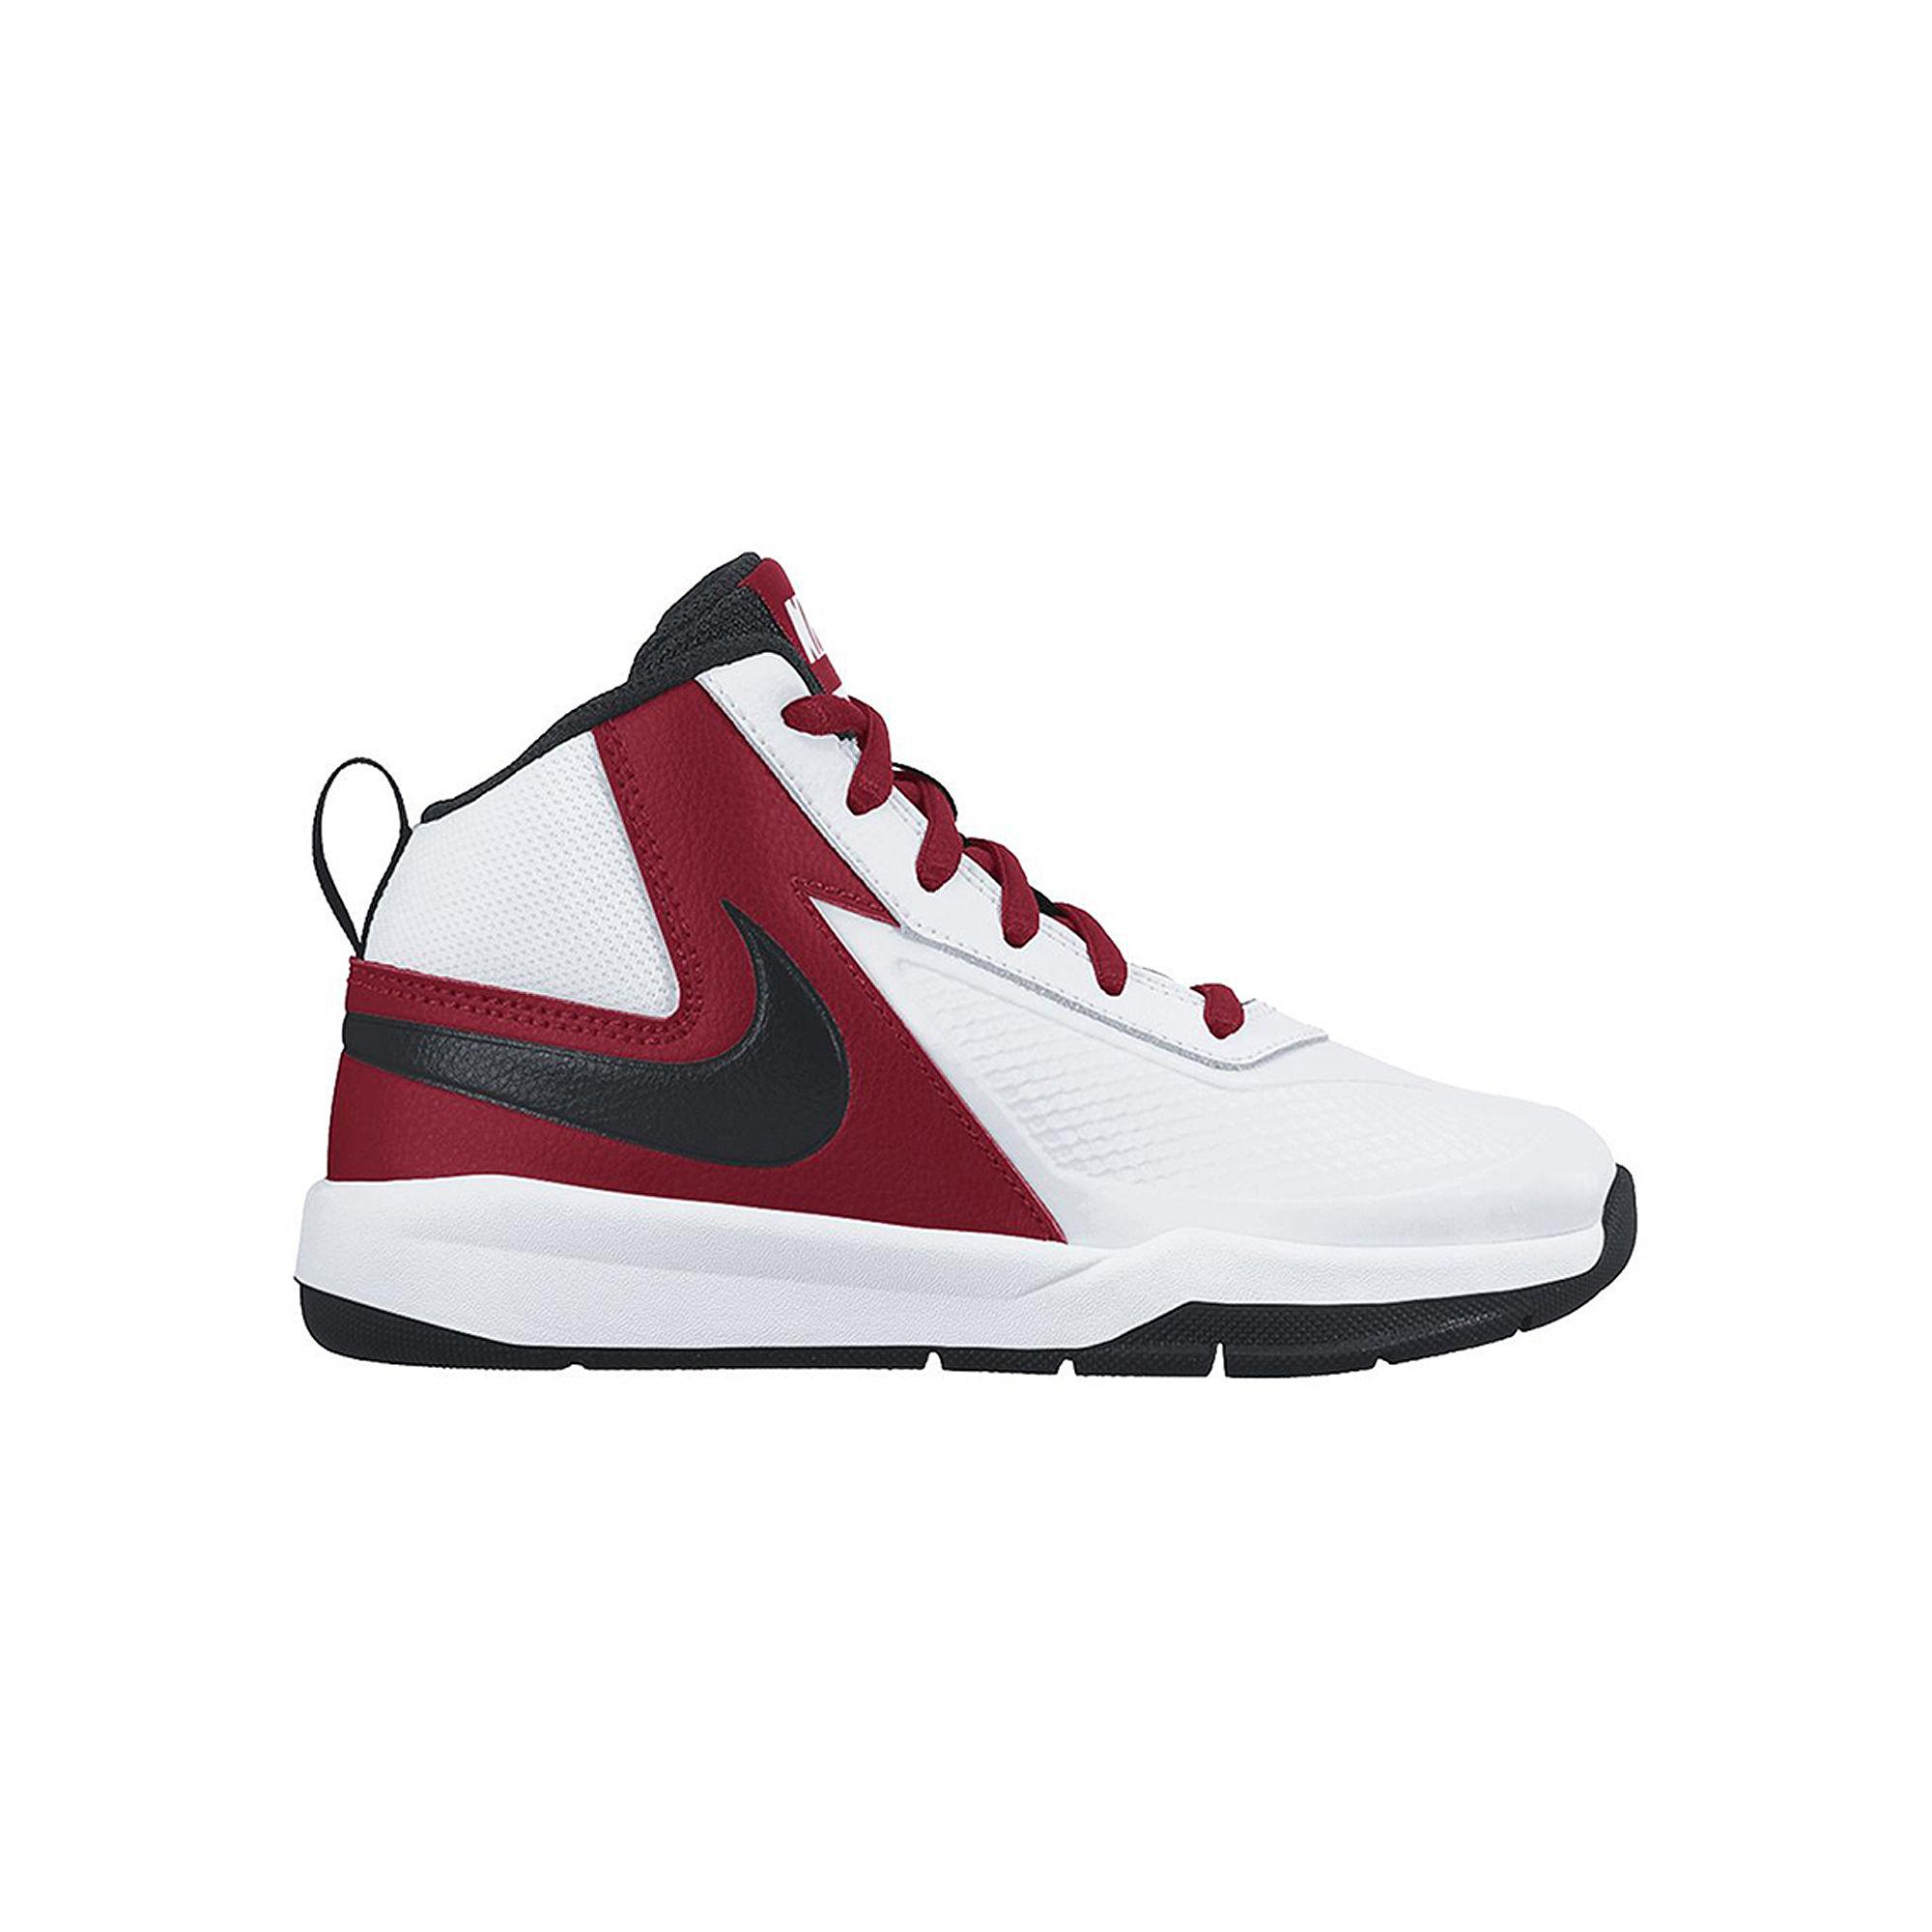 c4c56fbef170 ... UPC 888409436114 product image for Nike Team Hustle D7 Boys Basketball  Shoes - Little Kids